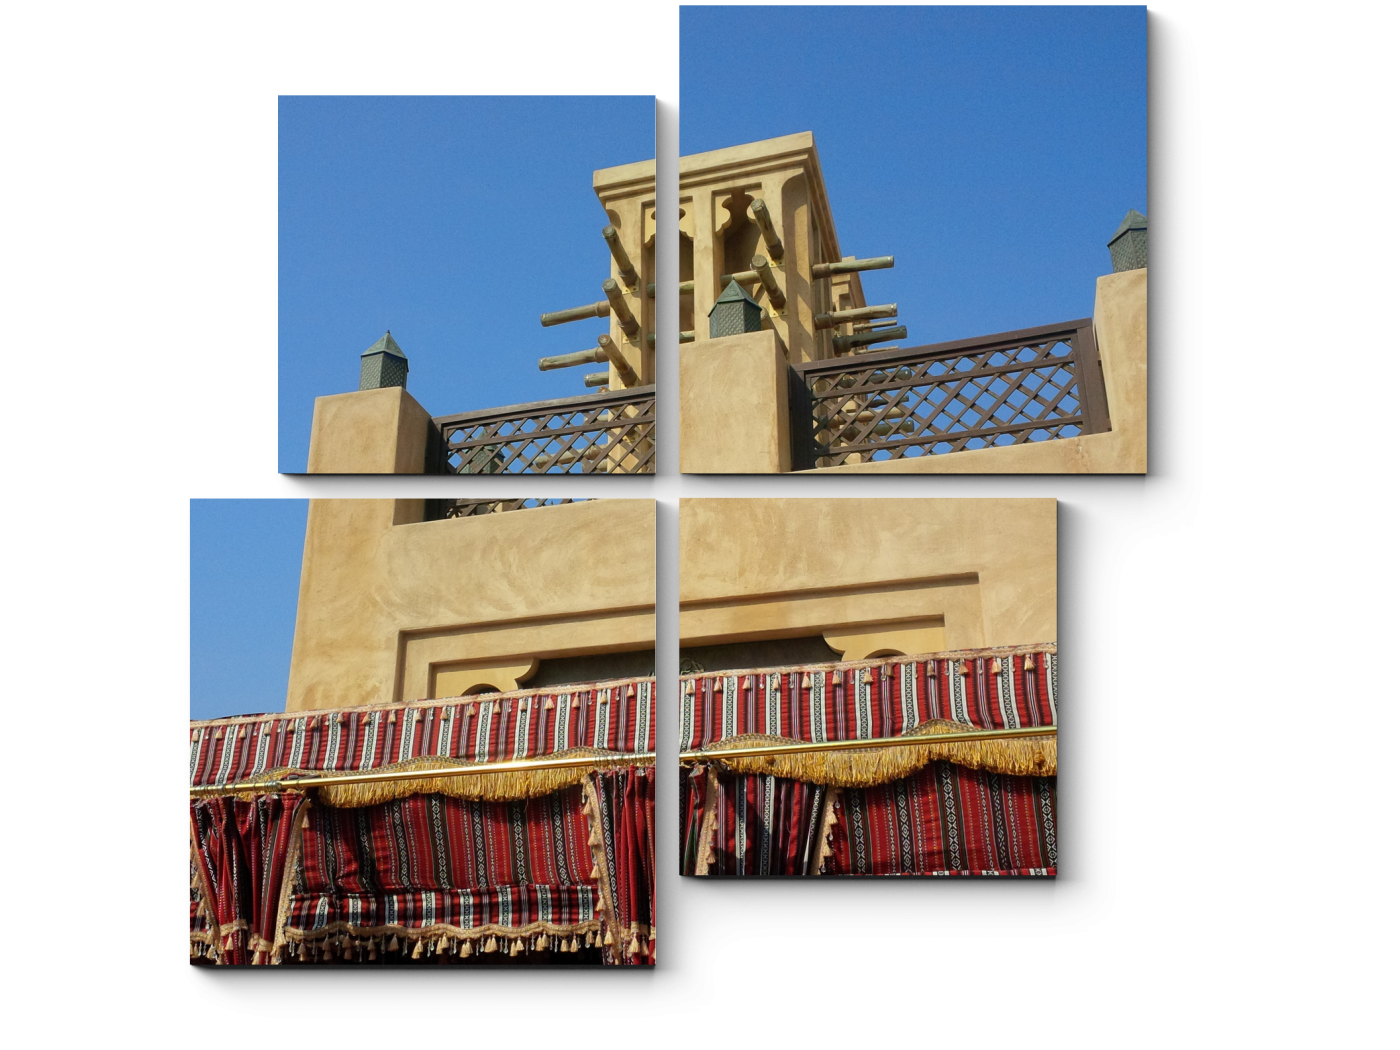 Модульная картина Арабская архитектура (50x50) фото